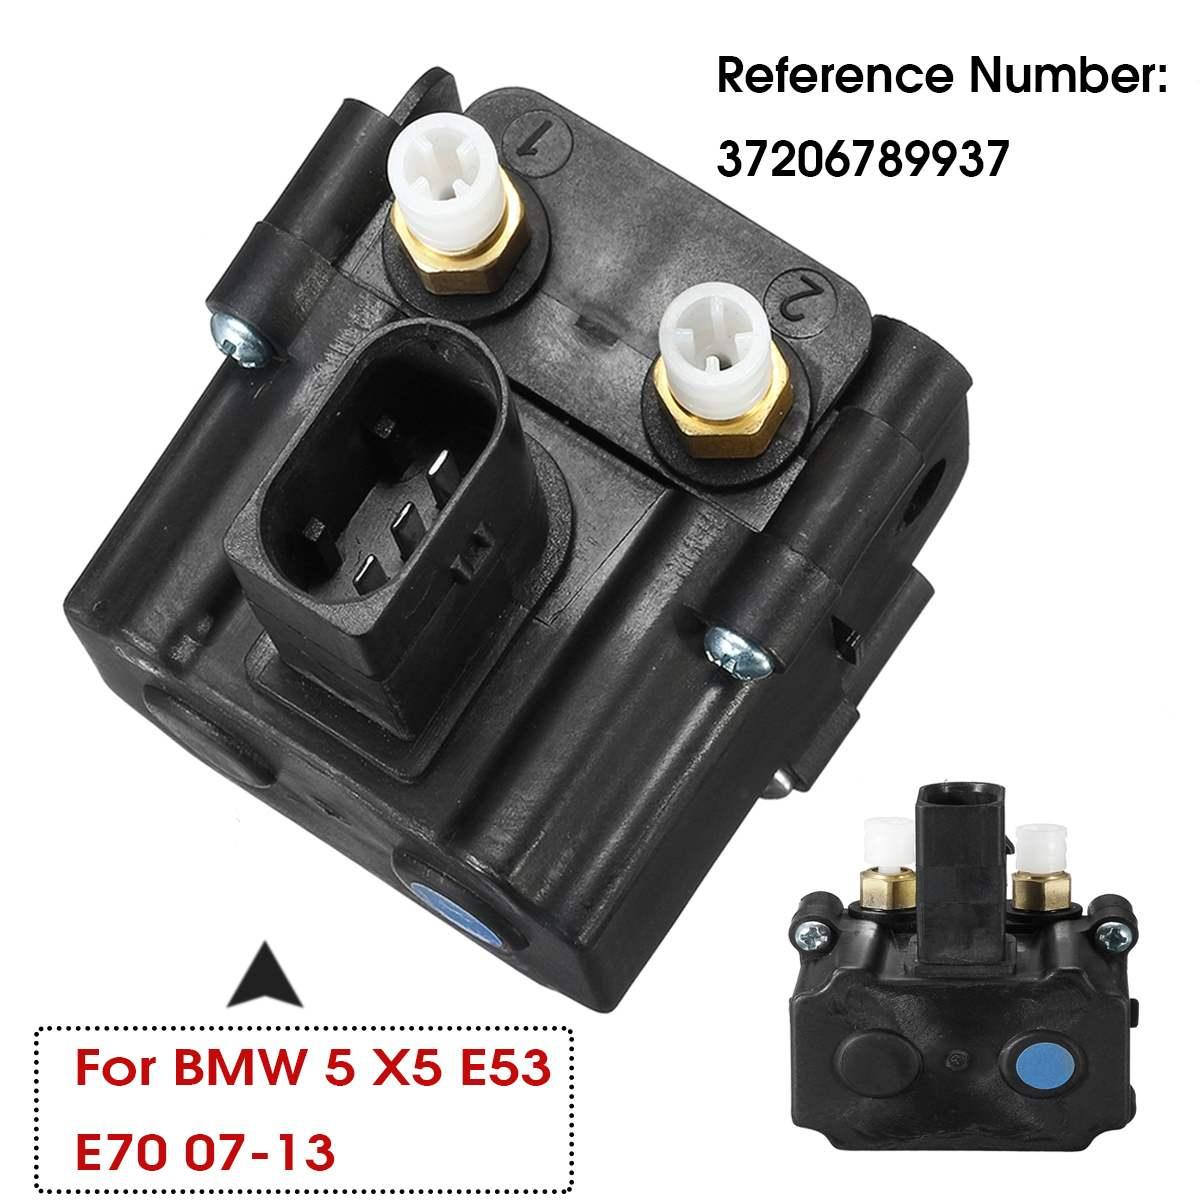 Air Suspension Solenoid Valve Block 37206789937 37206789938 For BMW E61 X5 E70 X6 E71 E72 520 523 525 530 535 545 2006-2013 2012